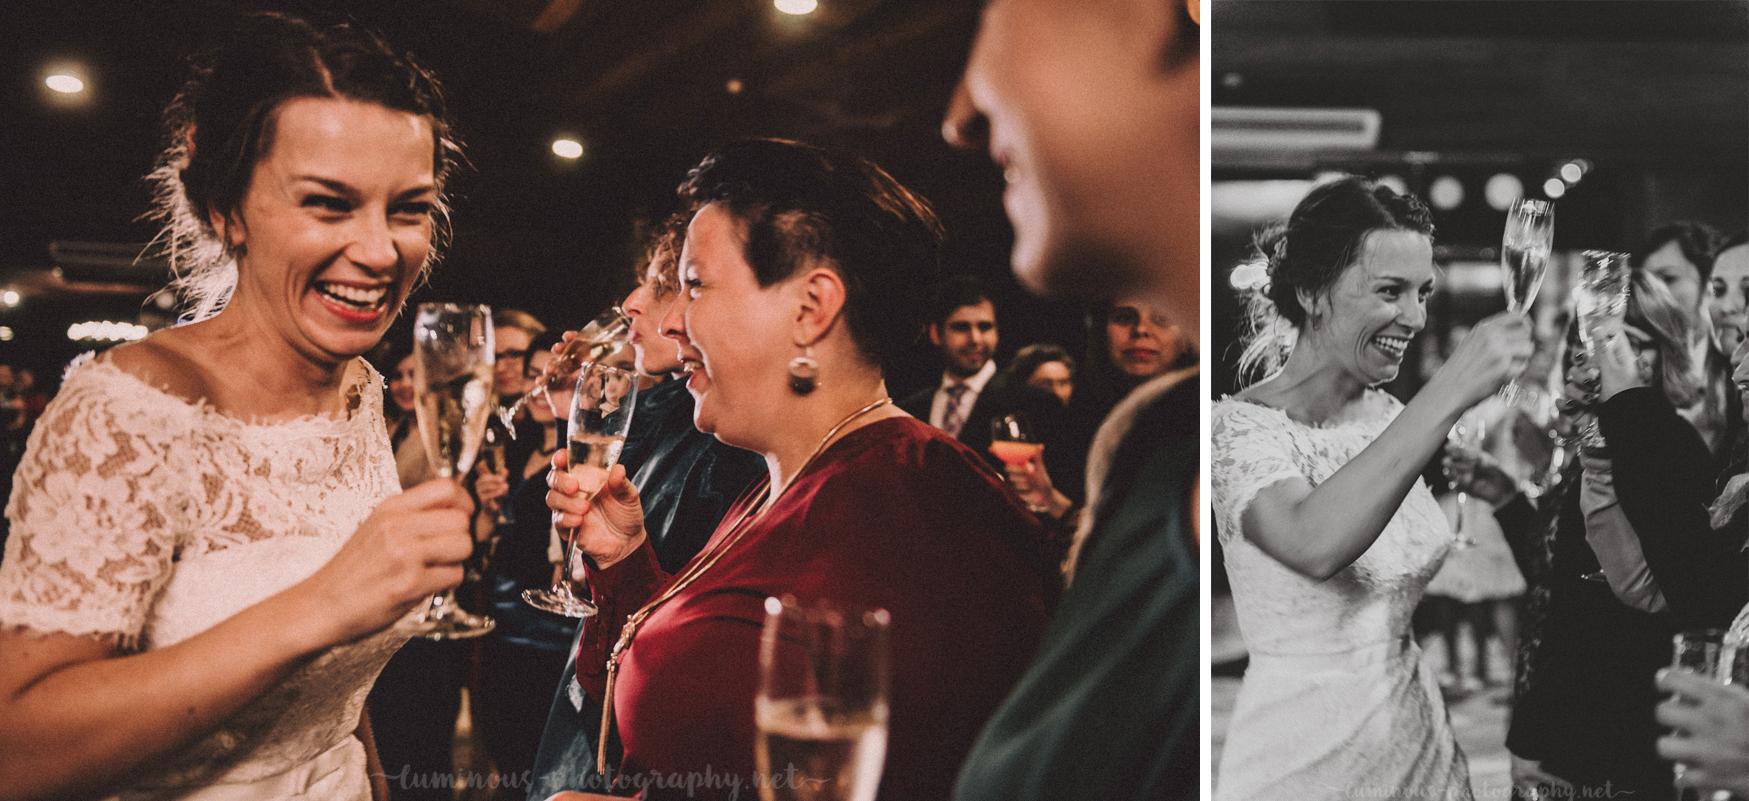 casamento-wedding-luminous-photography-porto-karolina-pedro-308.jpg